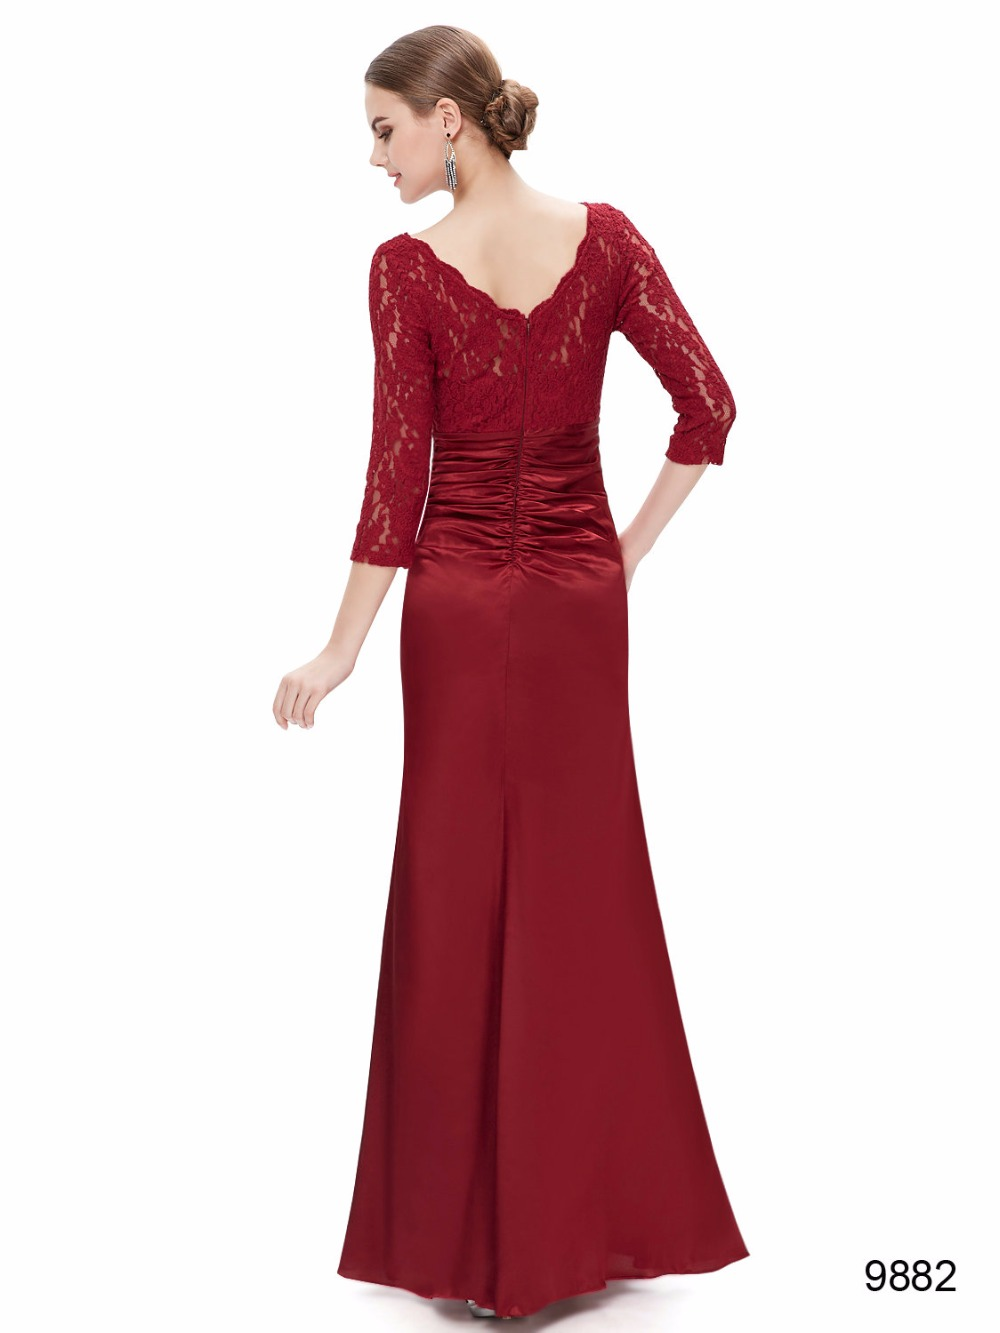 Long Bridesmaid Dresses Clearance